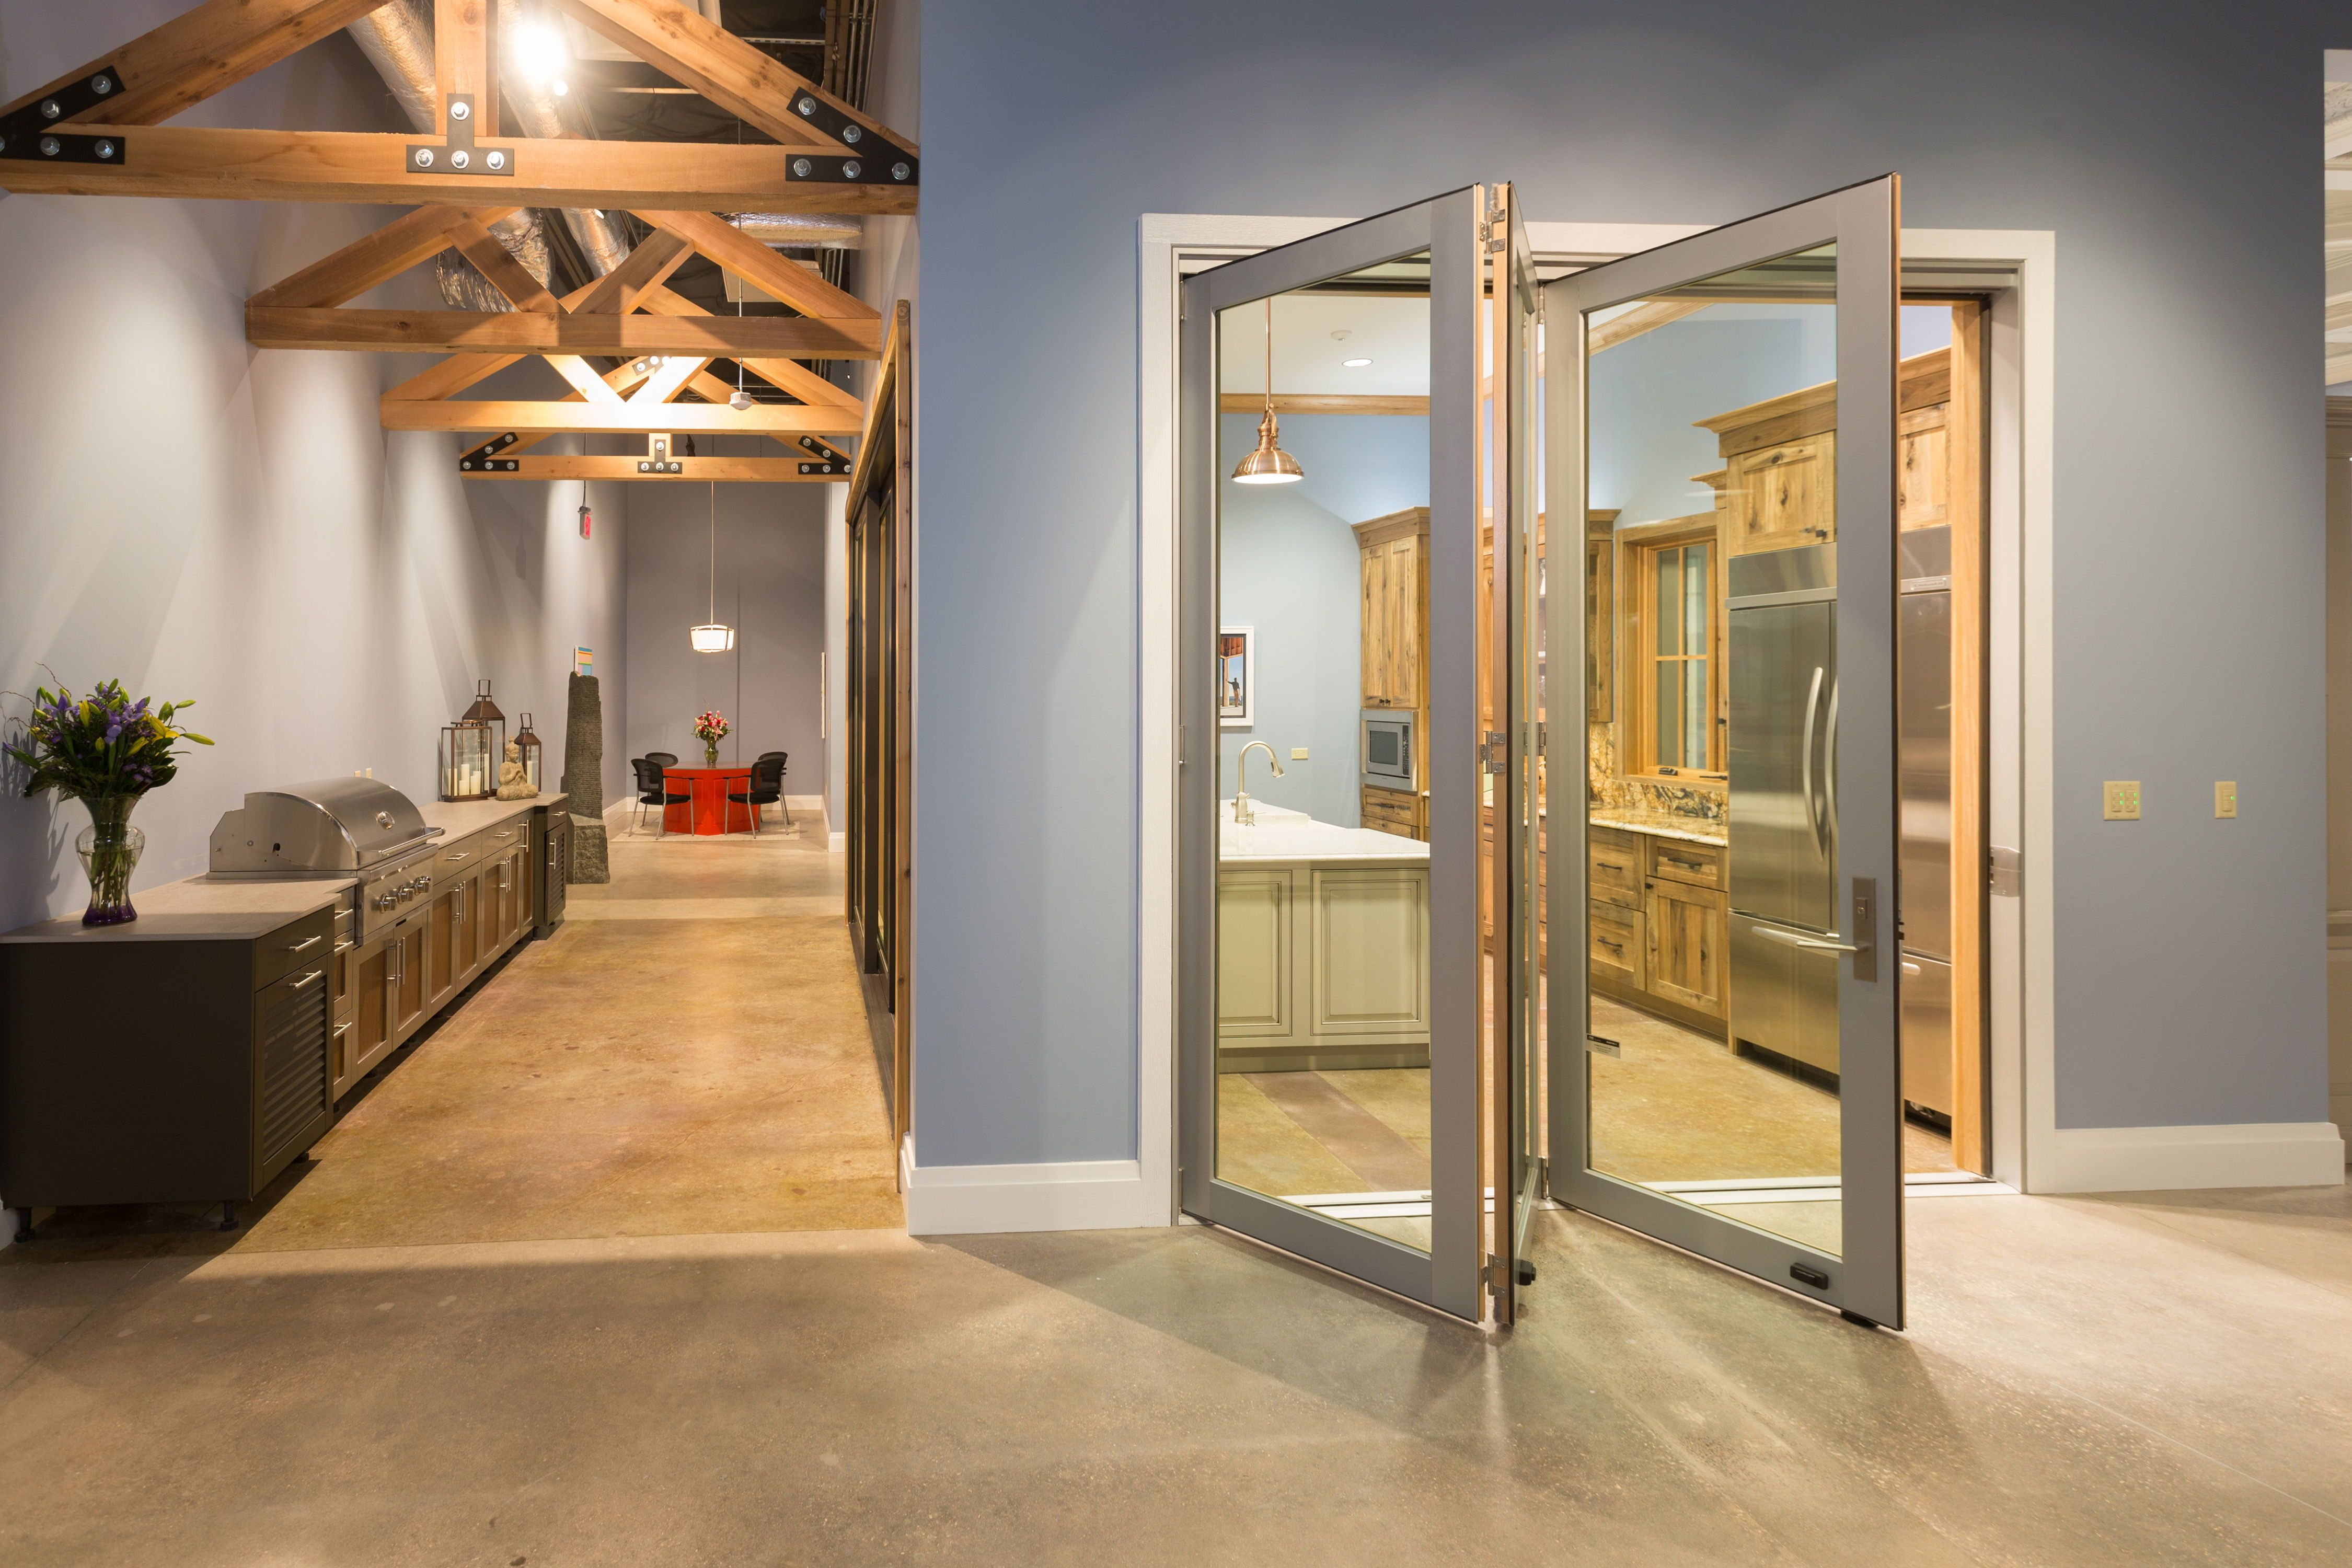 Folding Exterior Door Inspiration Bmc Design Center Folding Doors Exterior Home Design Magazines Showroom Design